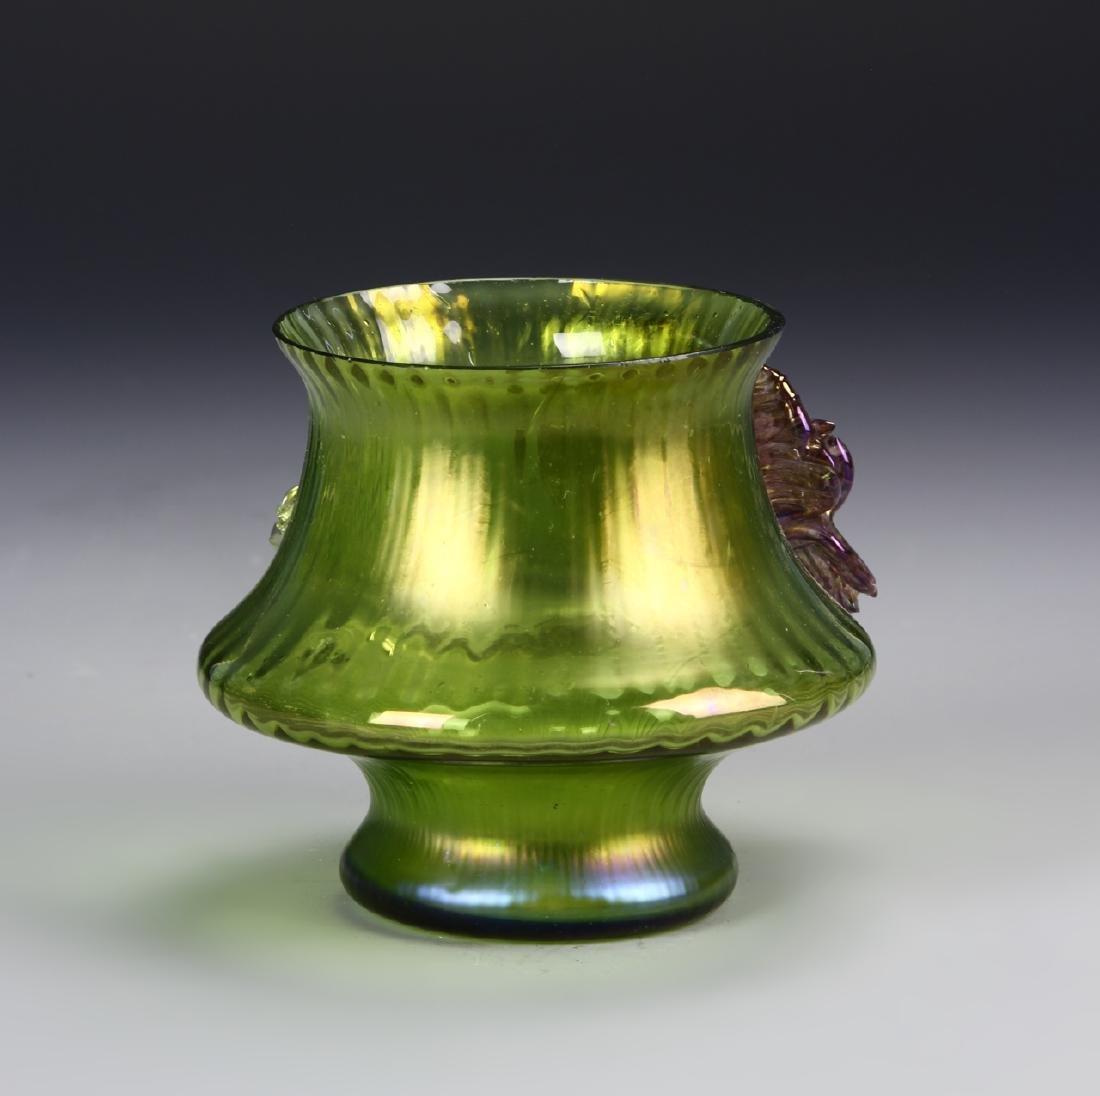 Tiffany Style Glass Jar - 2